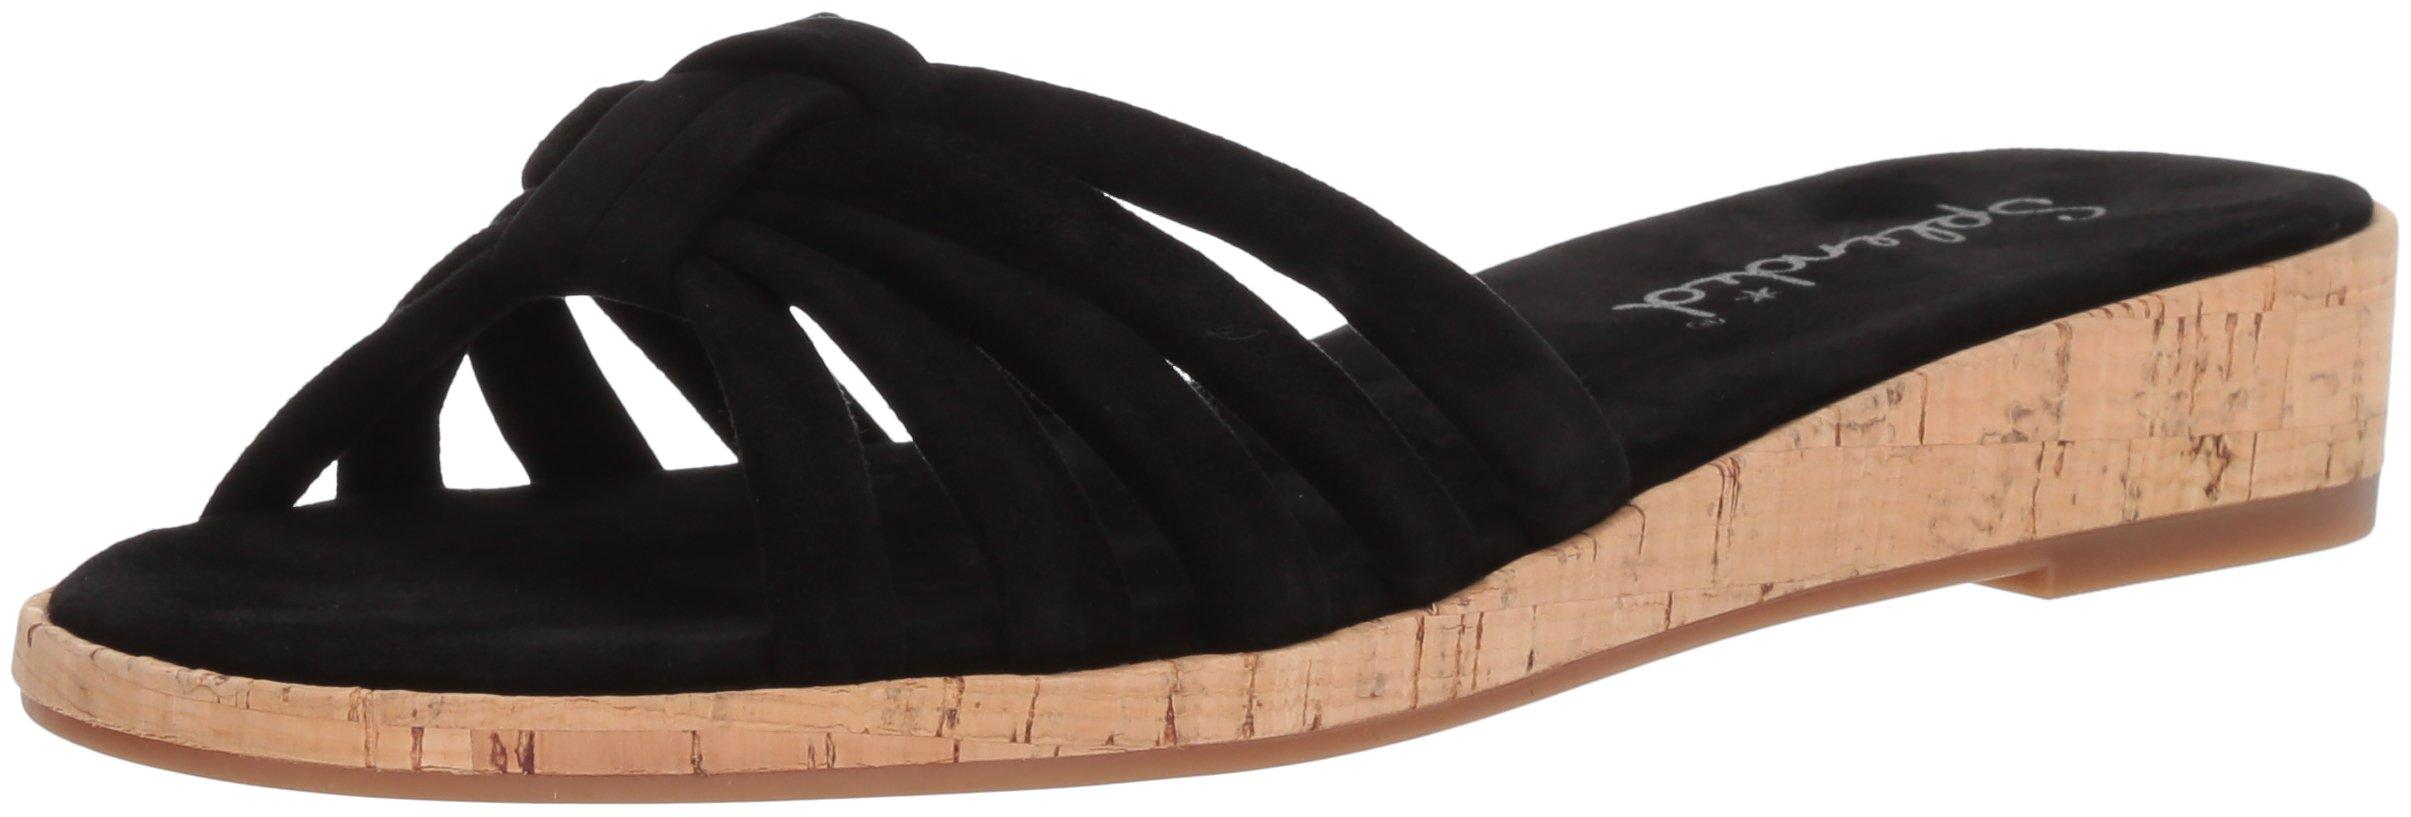 Splendid Women's Faith Flat Sandal, Black, 9.5 Medium US